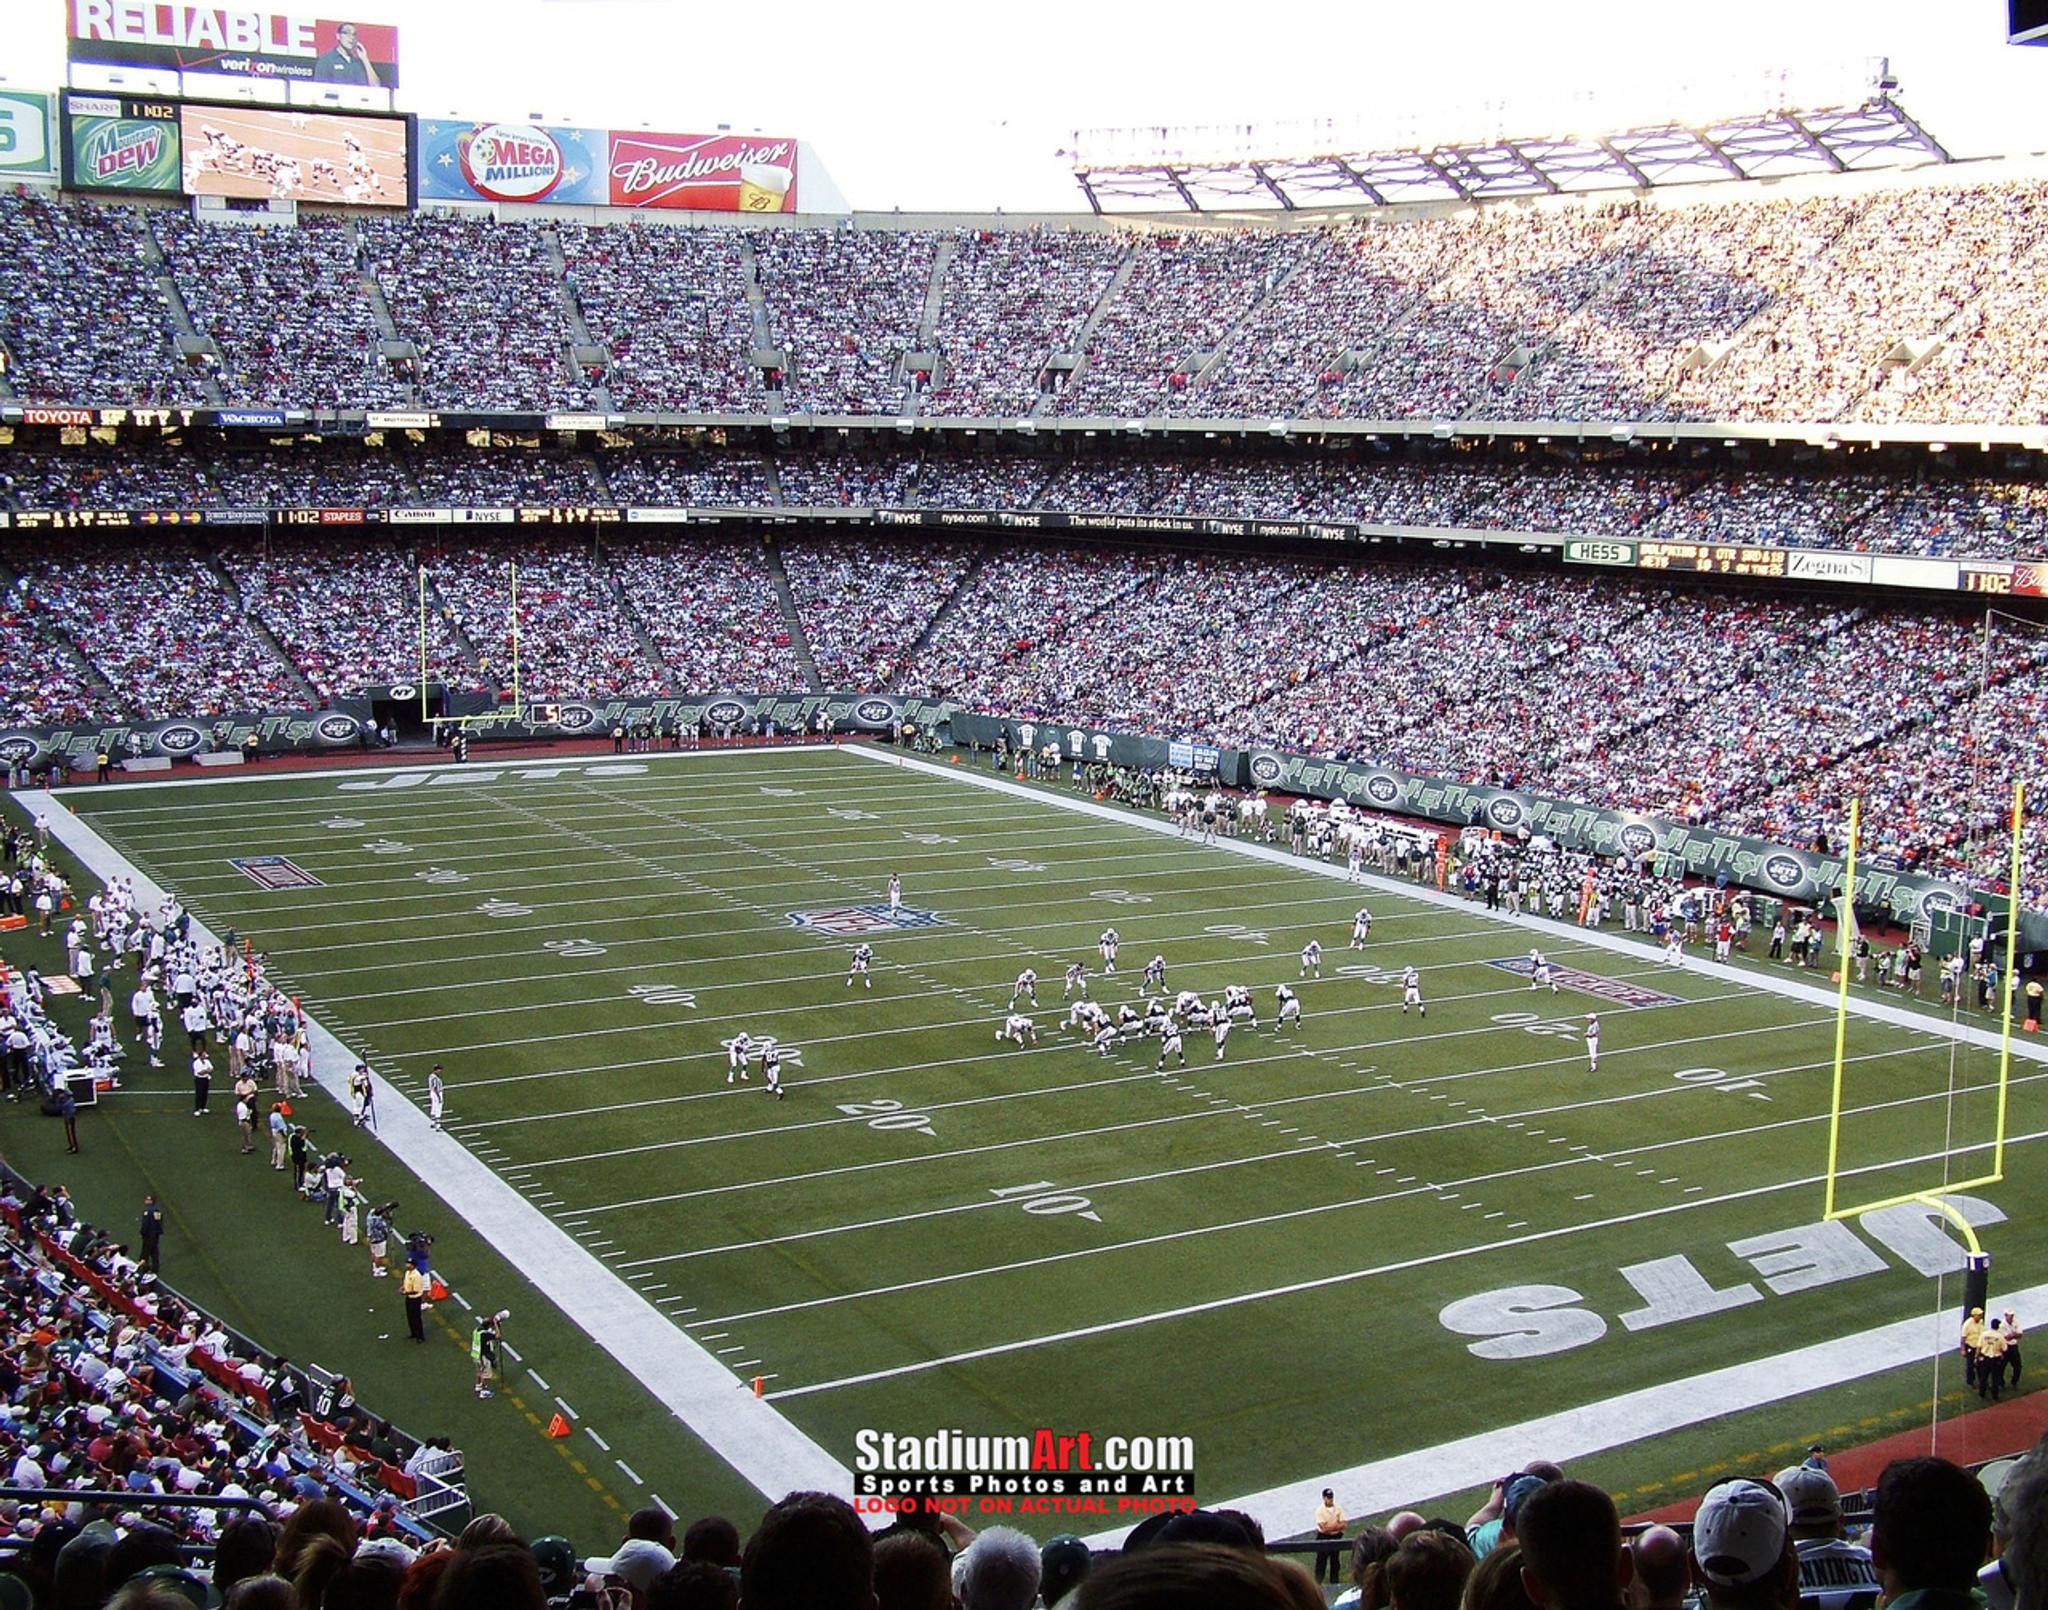 483b5760a01 New York Jets Stadium NFL Football Photo Art Print 8x10 or 11x14 or 40x30  StadiumArt.